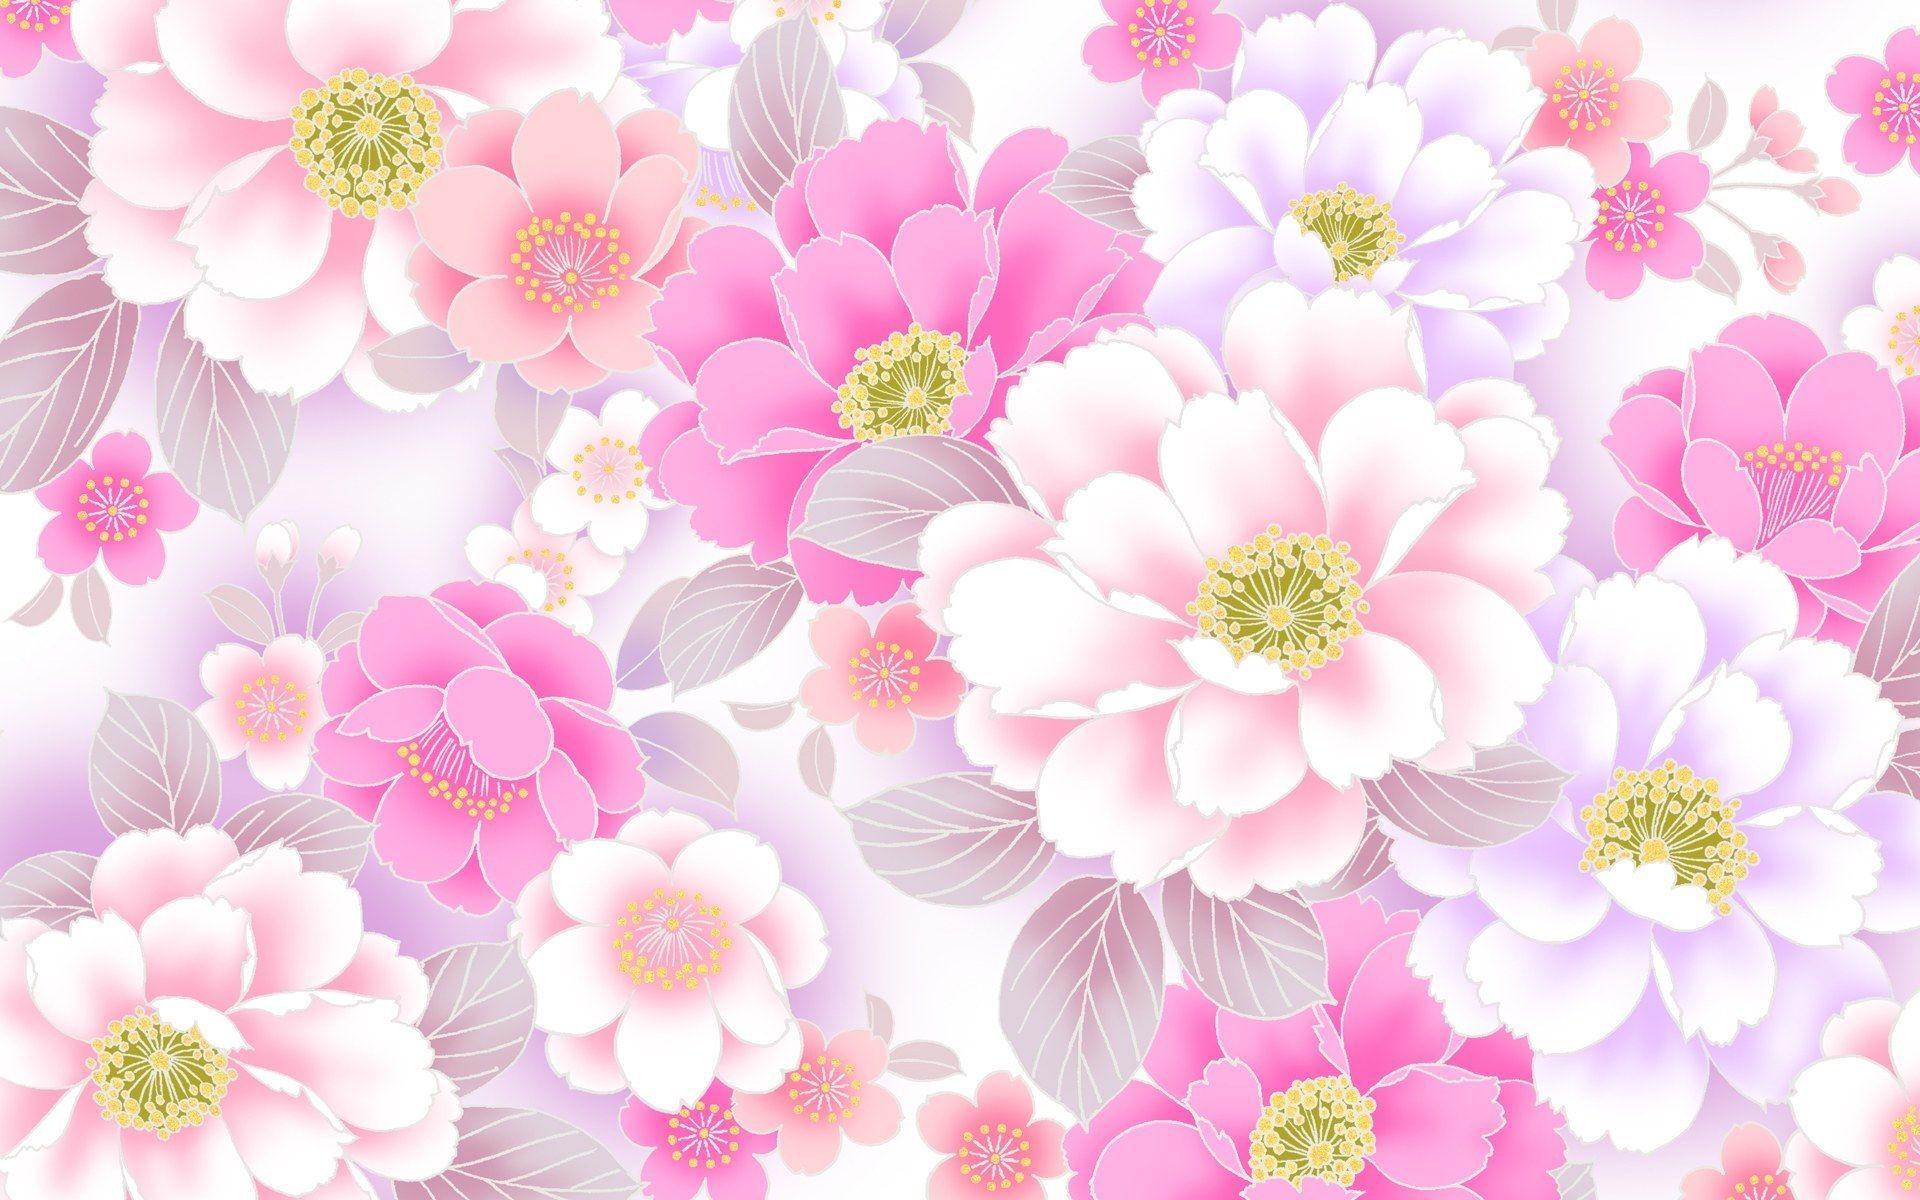 Pink Desktop Wallpaper Themes 47 Images